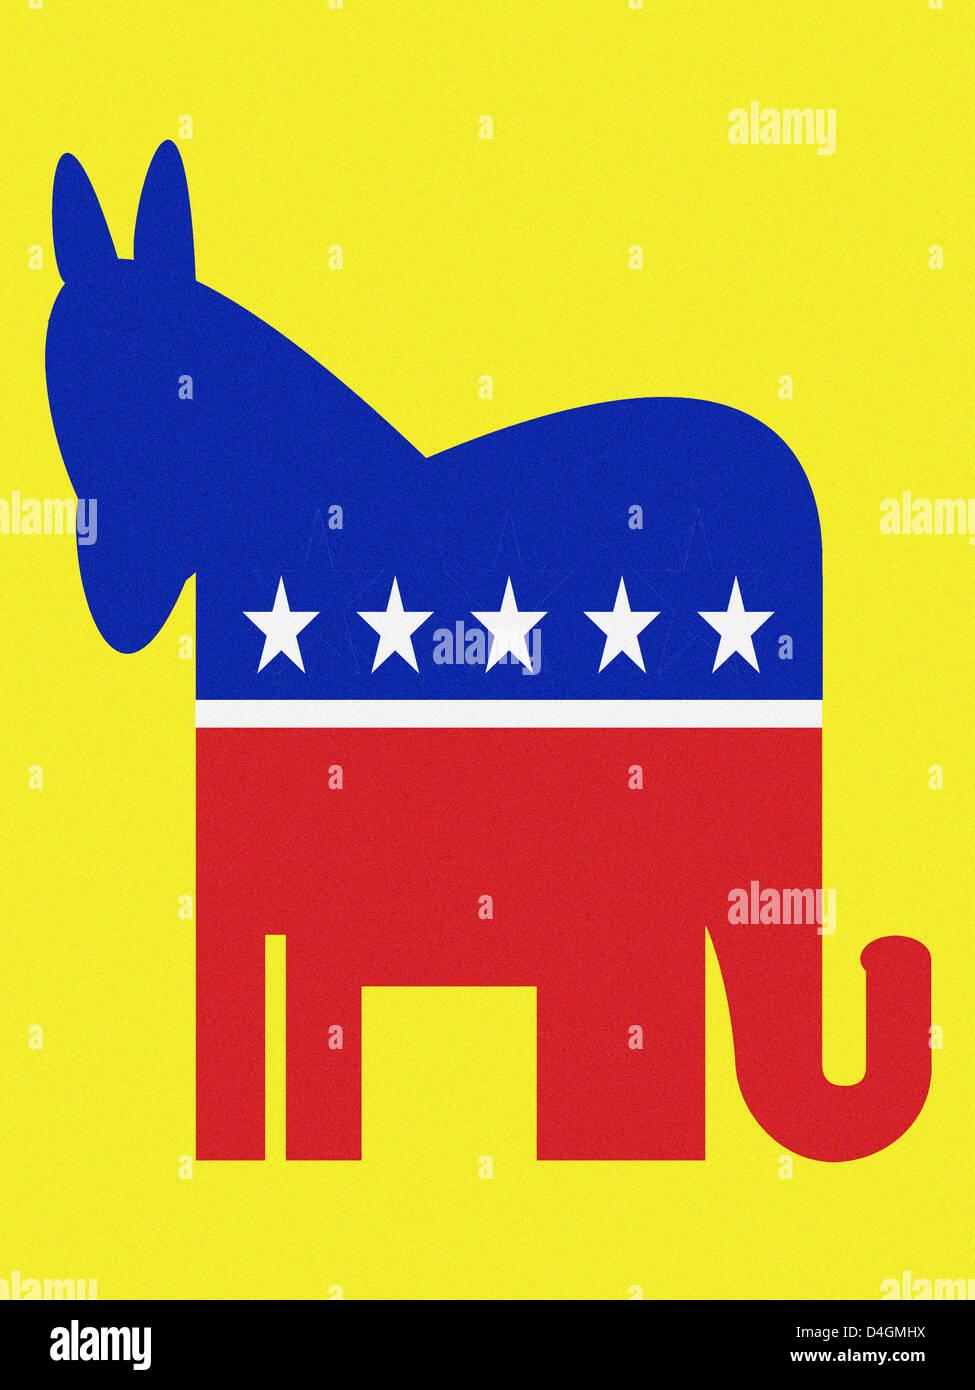 Democratic donkey and Republican elephant - Stock Image